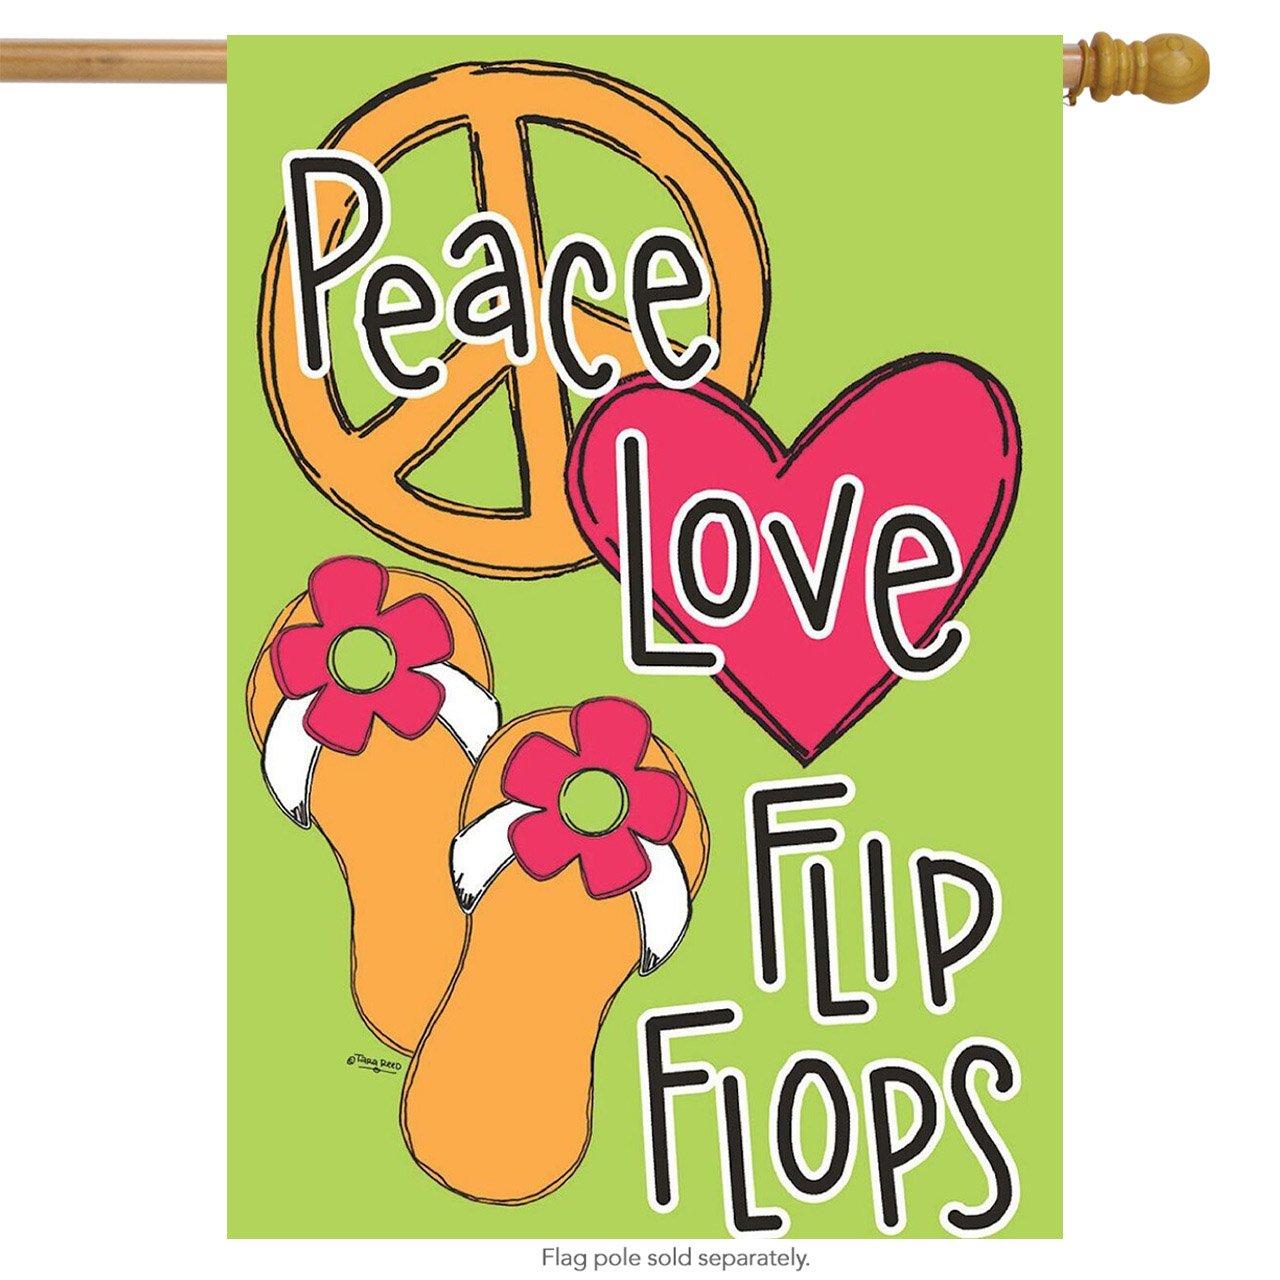 Paz amor chanclas bandera de porche 28